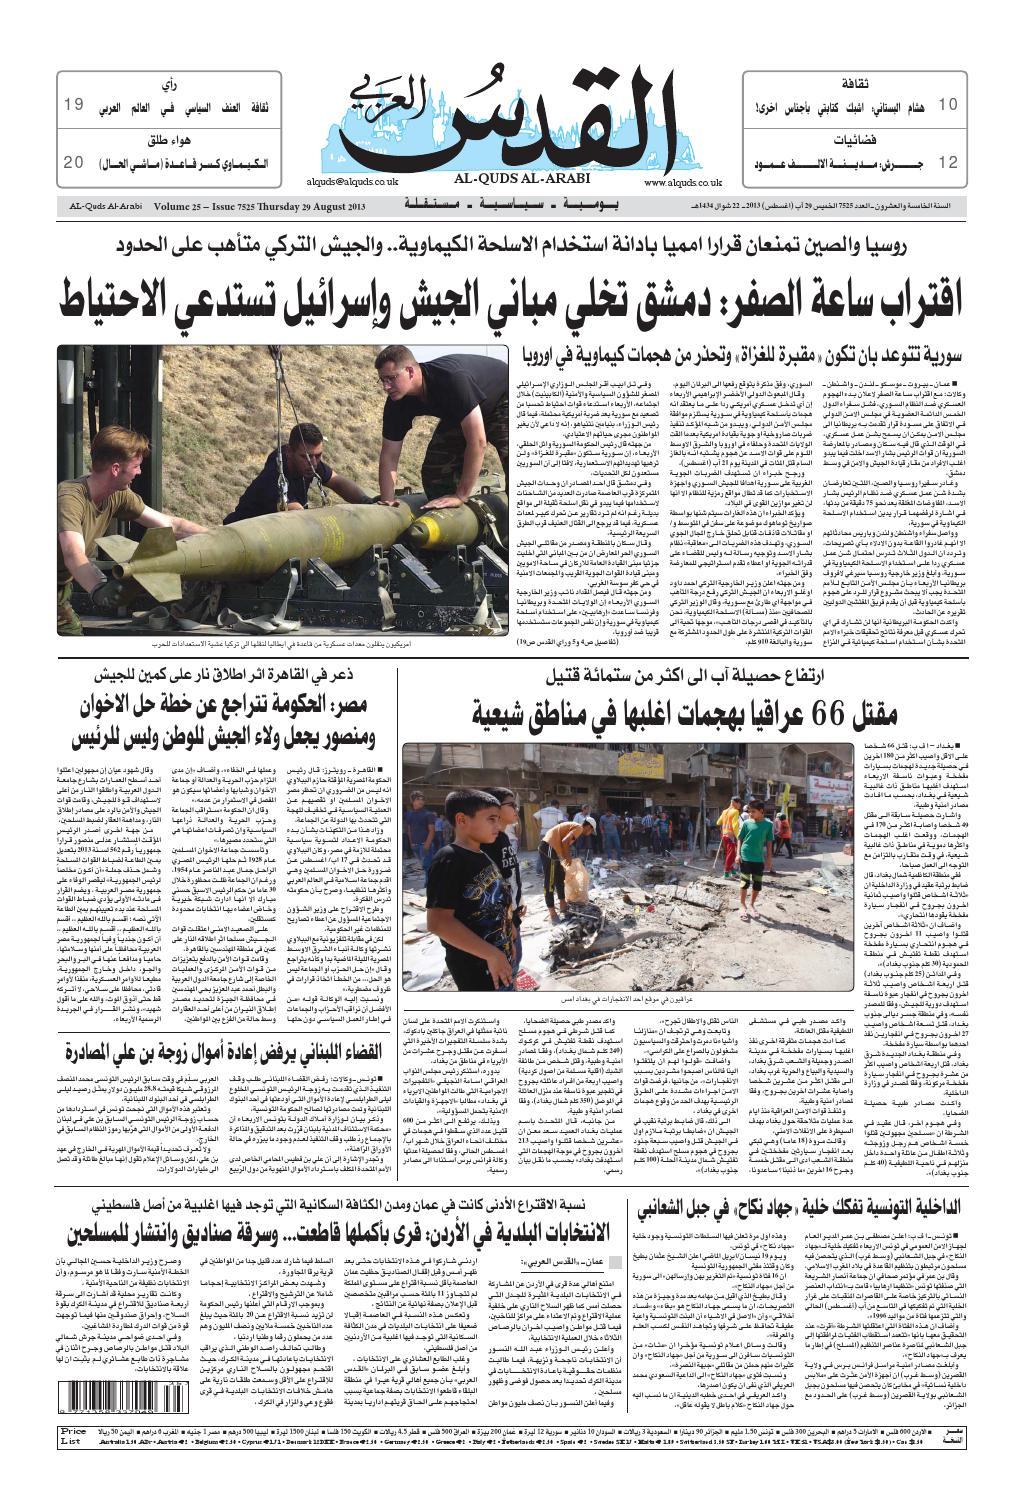 0bc8fd39e صحيفة القدس العربي , الخميس 29.08.2013 by مركز الحدث - issuu